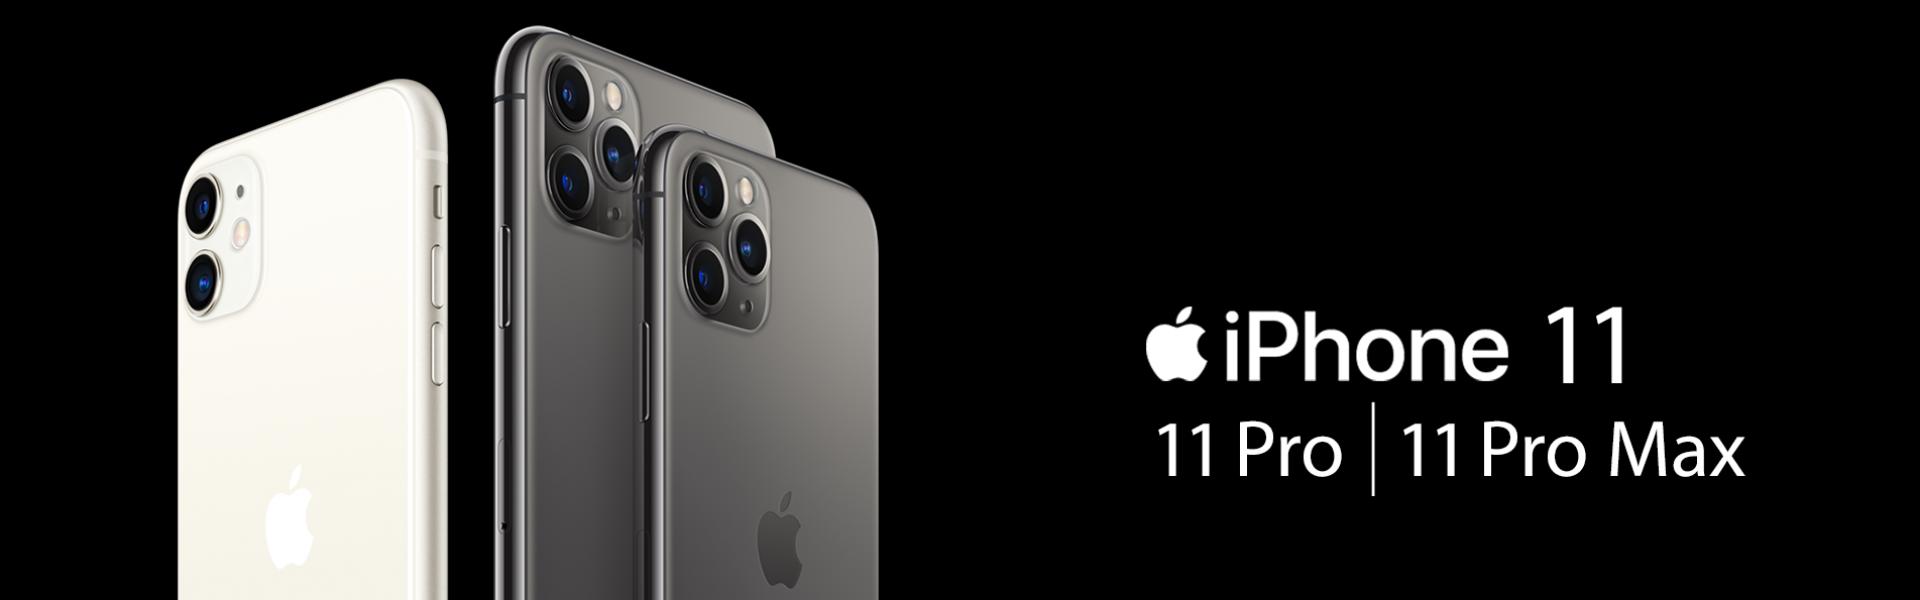 iPhone11 - Iphone 11 Web Banner - Duntel